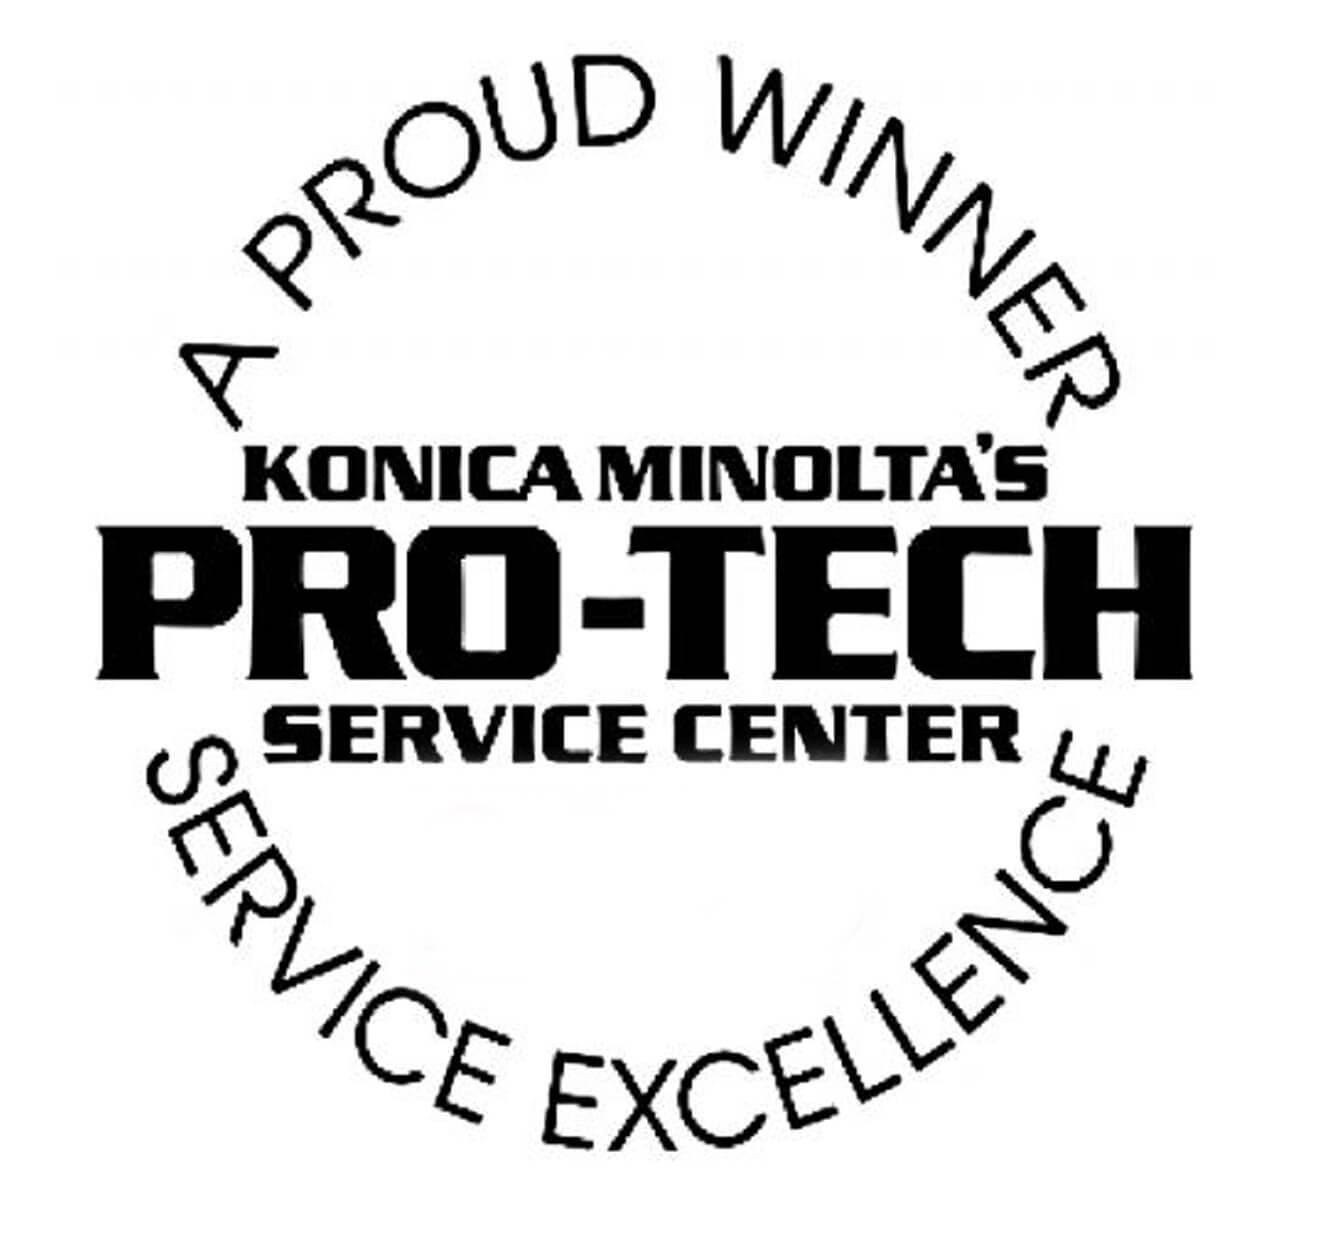 Konica Minolta's Pro-Tech Service Center Winner - The Swenson Group